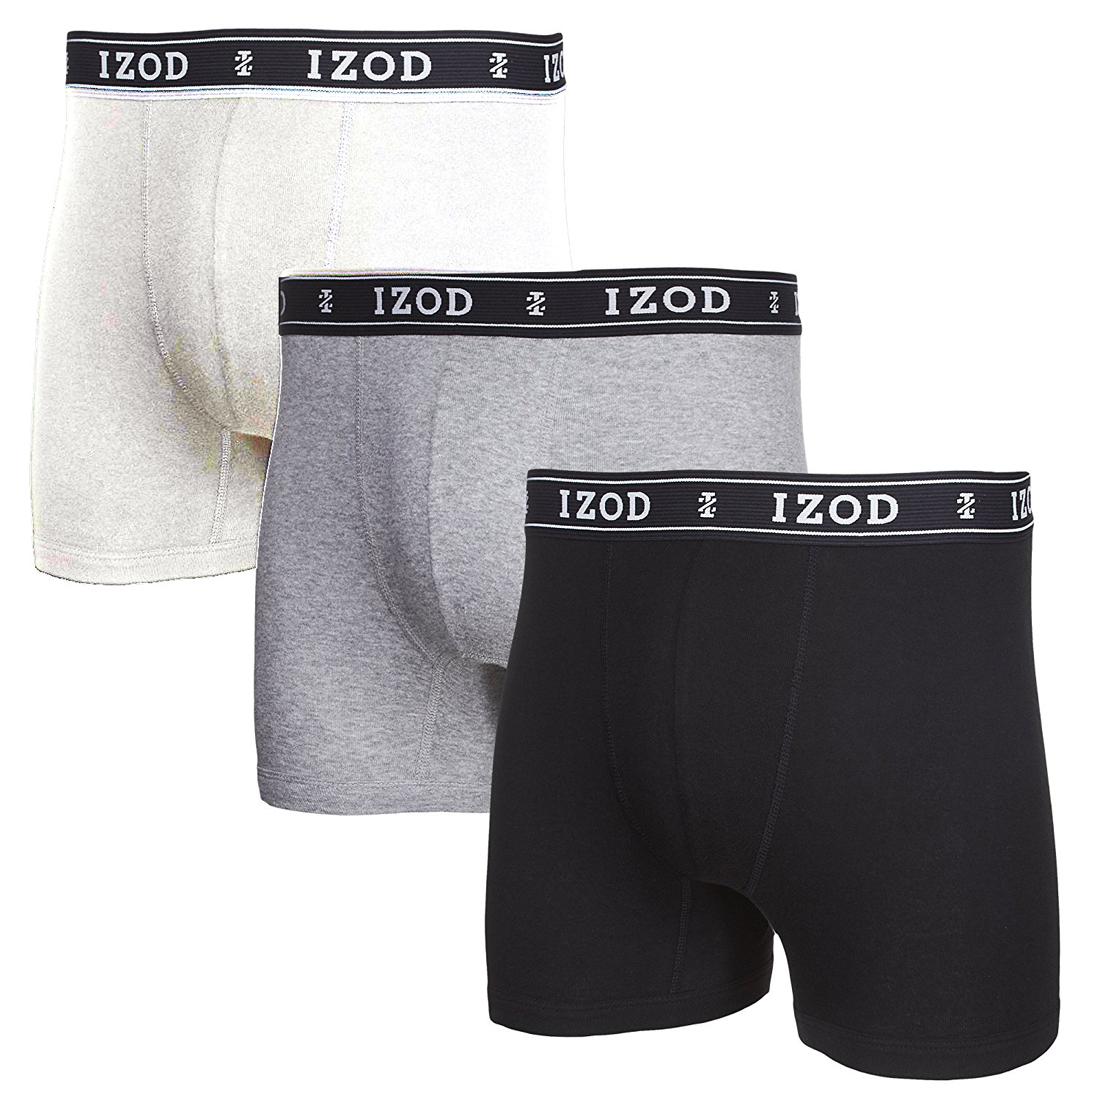 bbce632d653f IZOD Men's Knit Boxer Briefs - 3 Pack | eBay